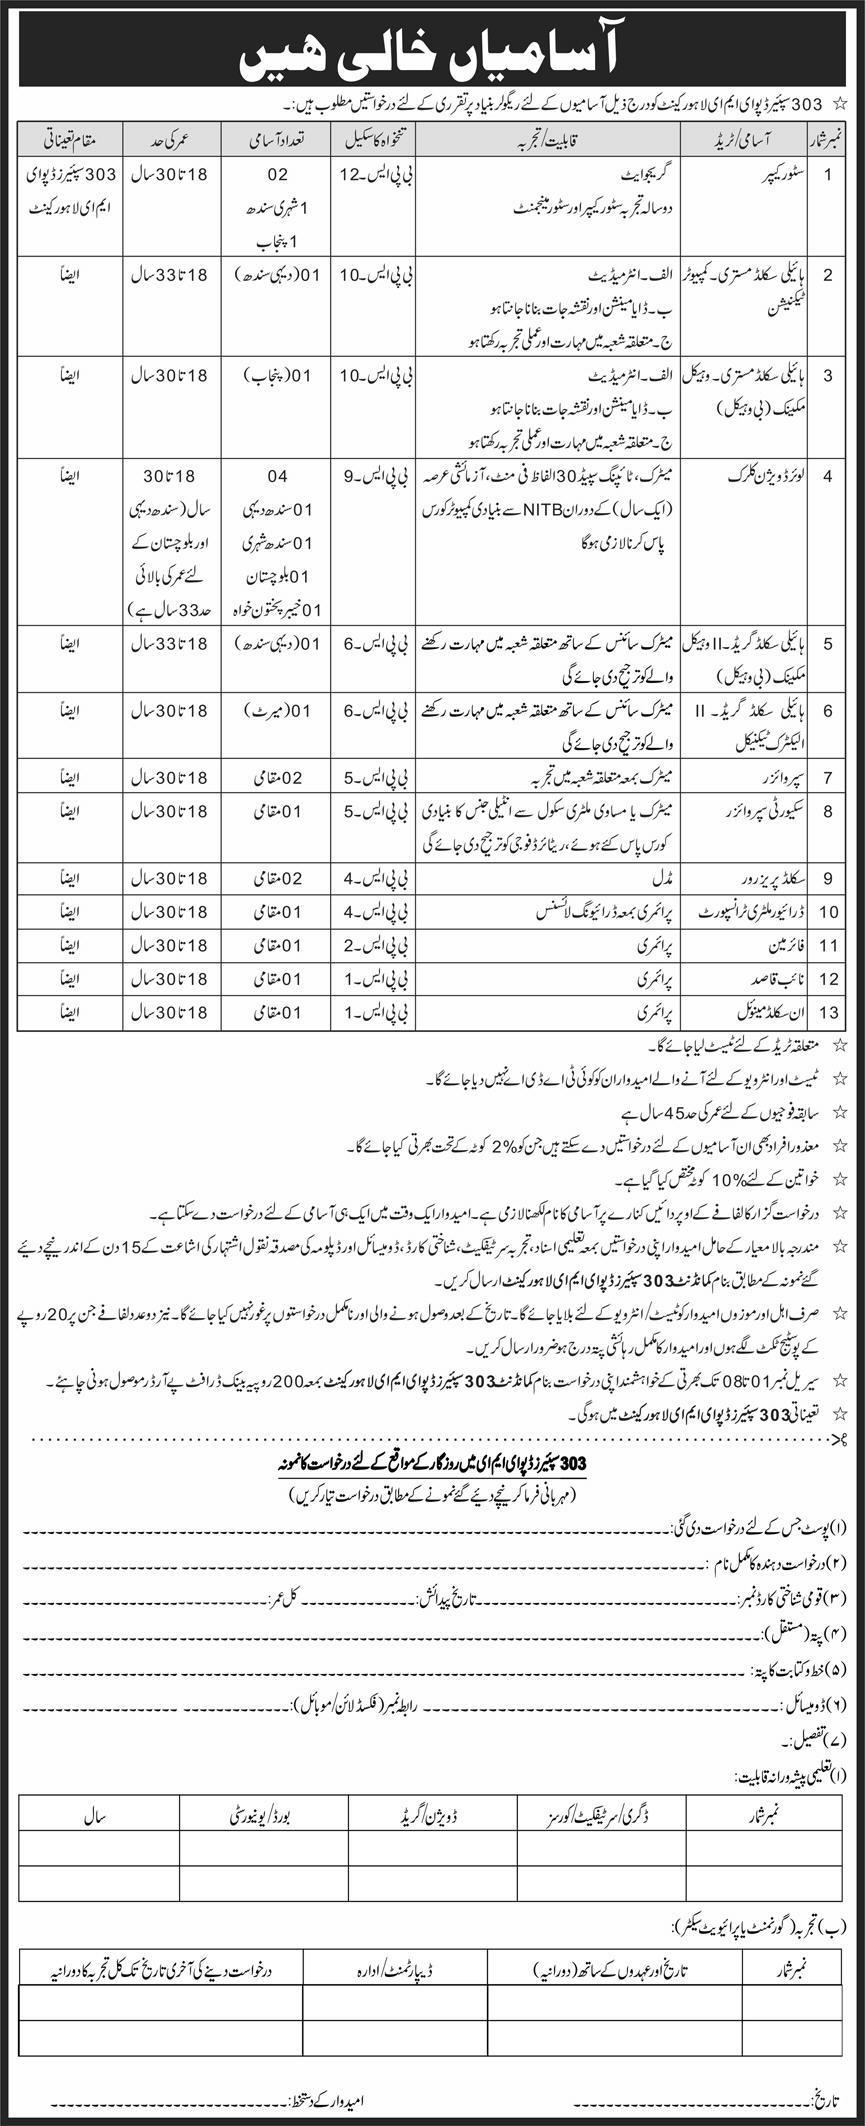 Pakistan Army Civilian Jobs October 2020